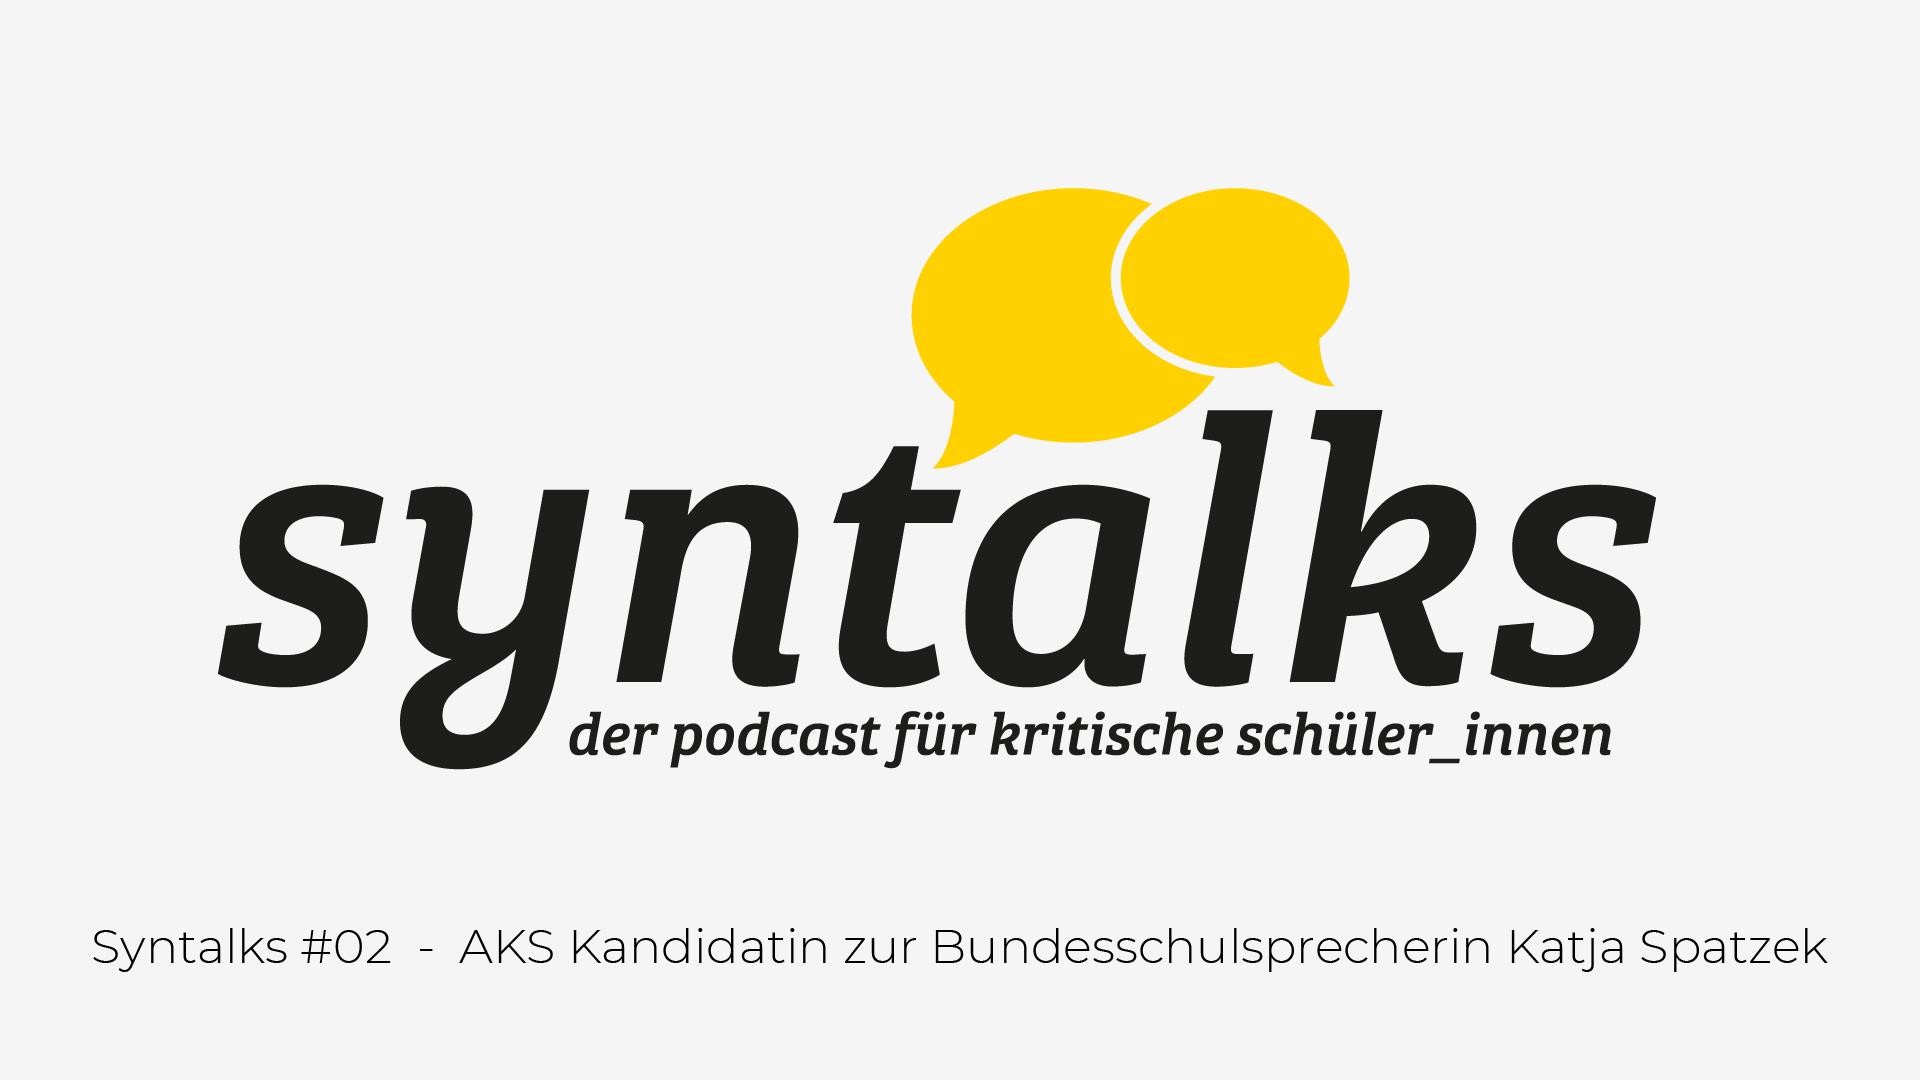 Syntalks #02